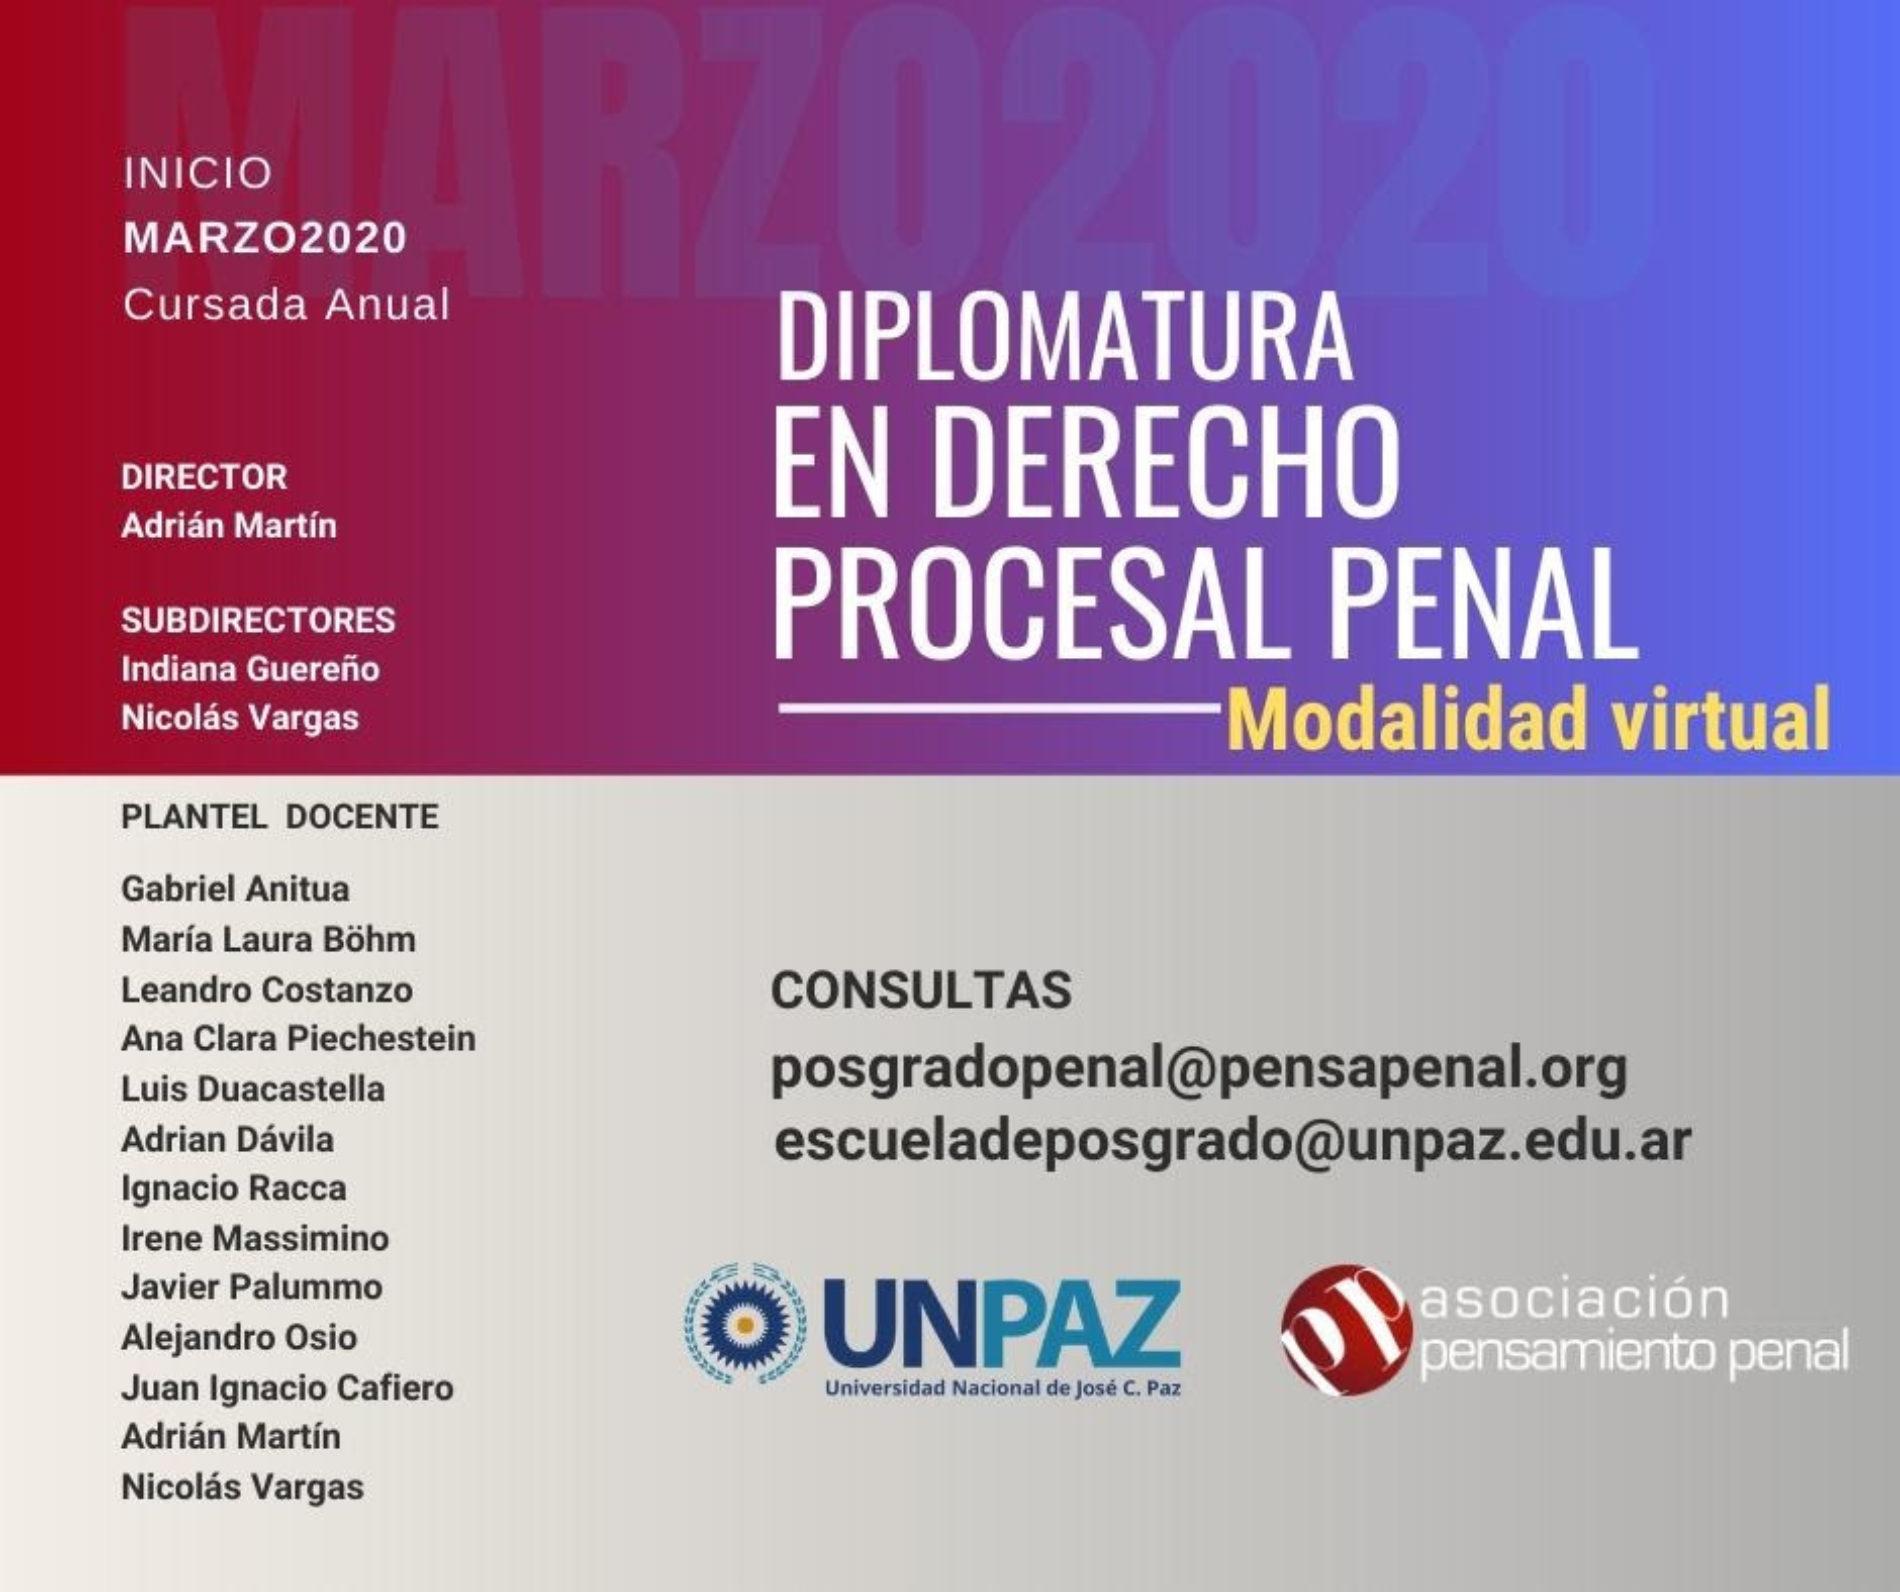 Diplomatura Virtual en Derecho Procesal Penal. APP+UNPaz